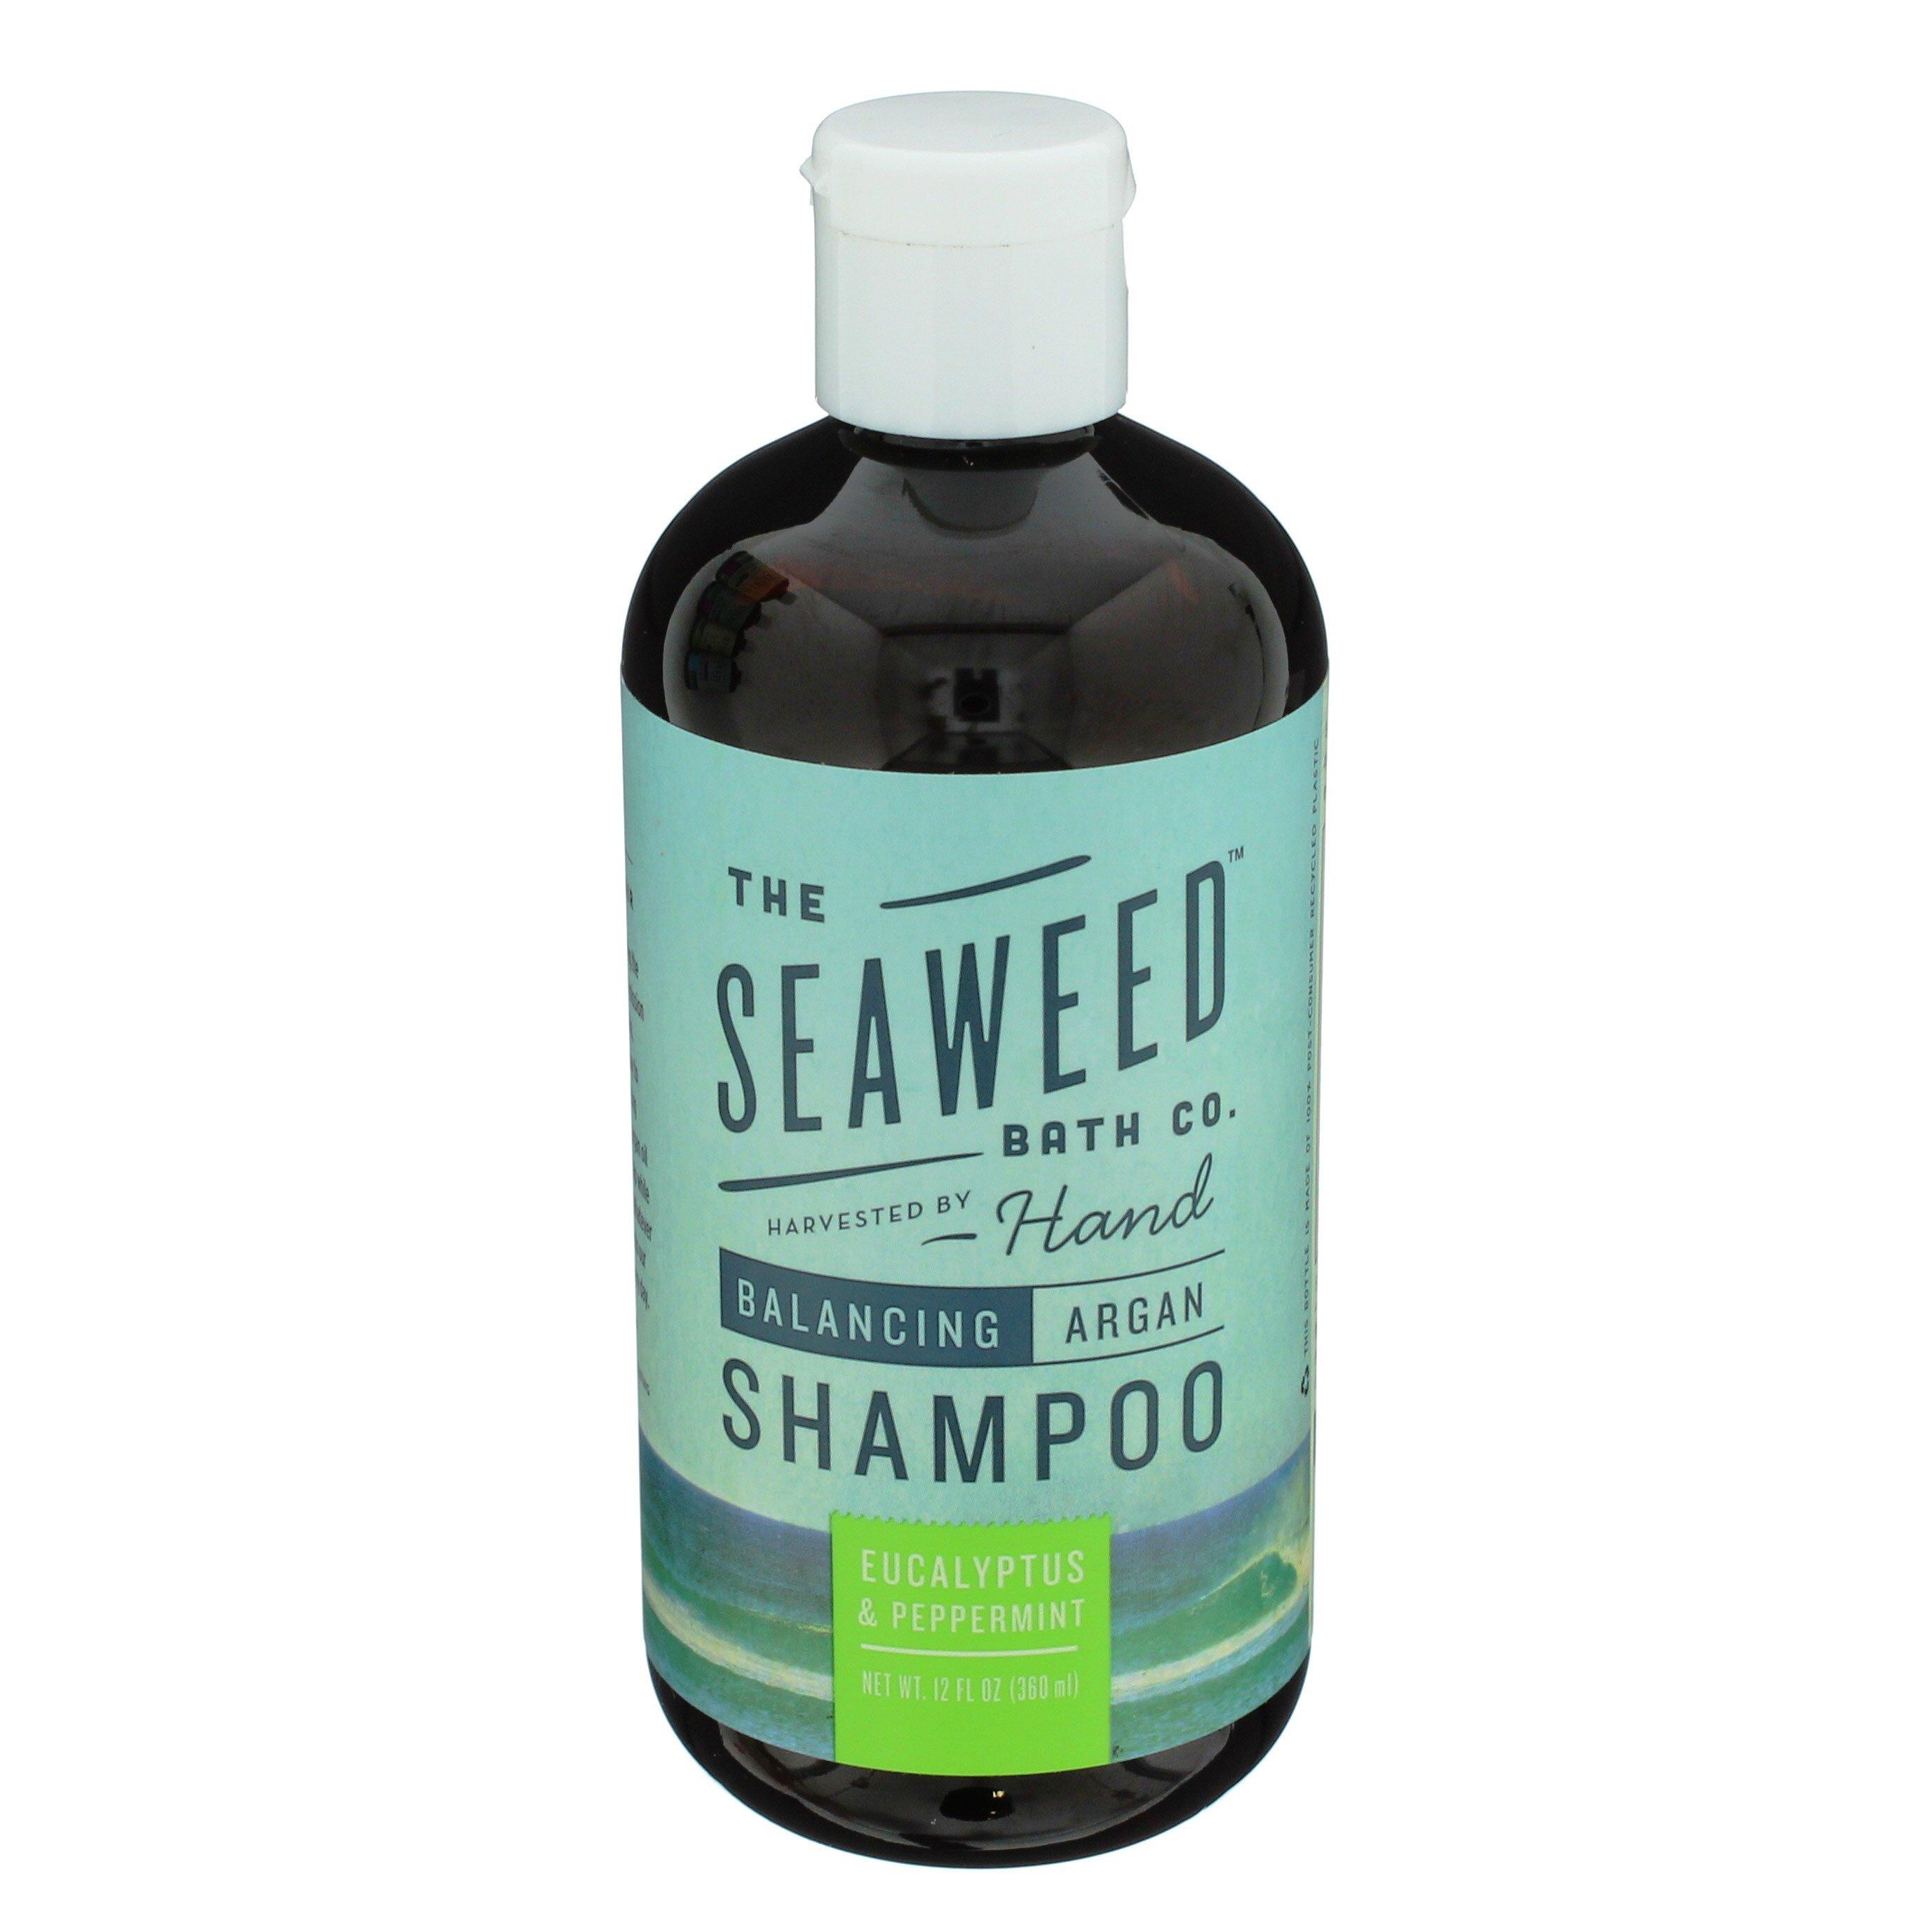 The Seaweed Bath Co Balancing Eucalyptus Peppermint Shampoo Shop Shampoo Conditioner At H E B